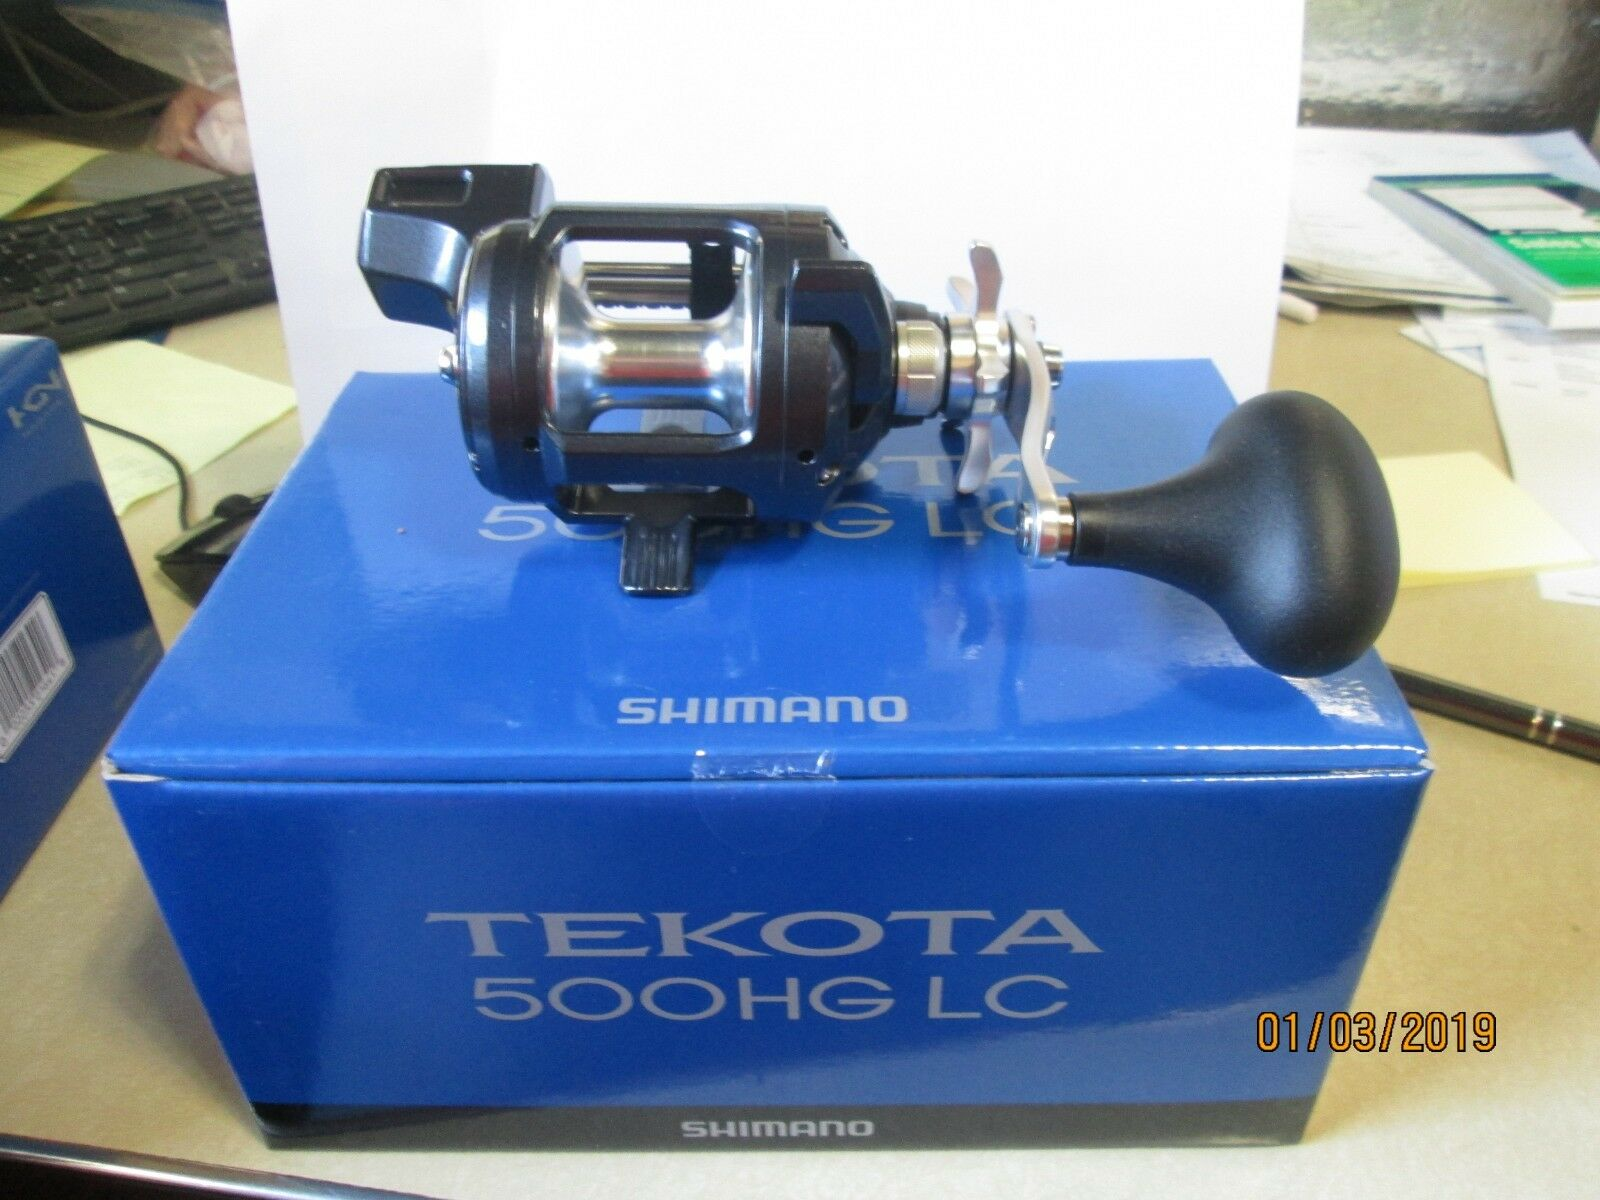 NEW MODEL SHIMANO TEKOTA 500HGLC LINE COUNTER  LEVEL WIND BAITCAST REEL 500 LC  fantastic quality